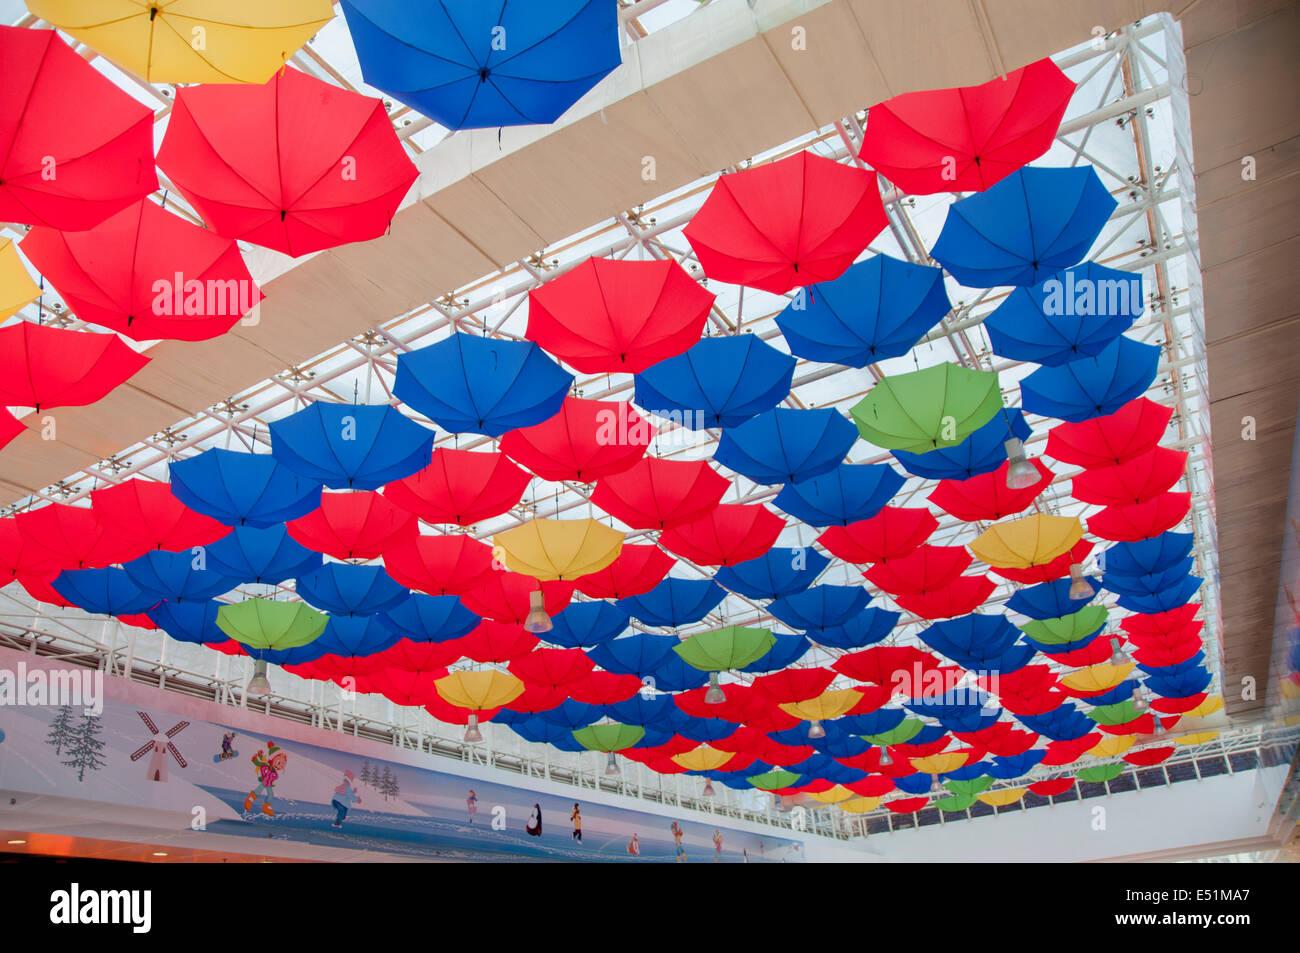 Bunte Regenschirme in Dach hängen Stockbild